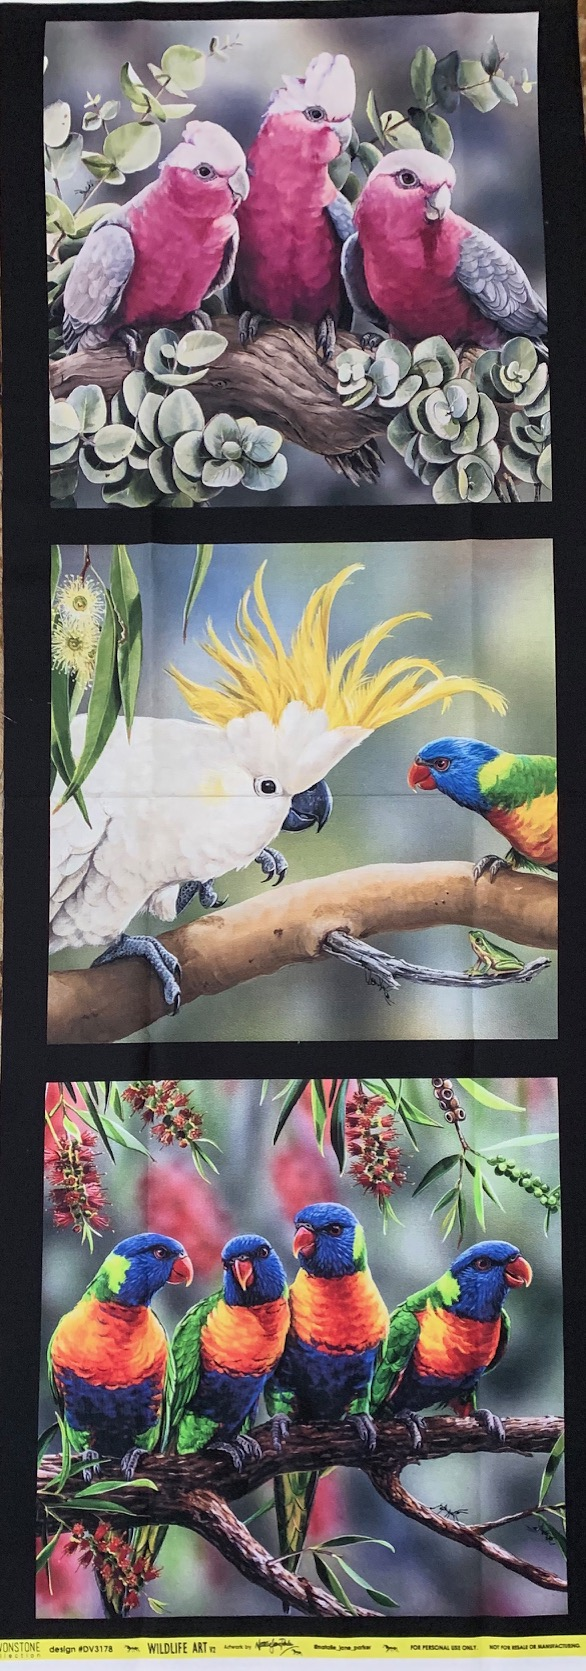 Morpeth Gallery Campbells Store Fabric panels new wildlife art Natalie Jane Parker